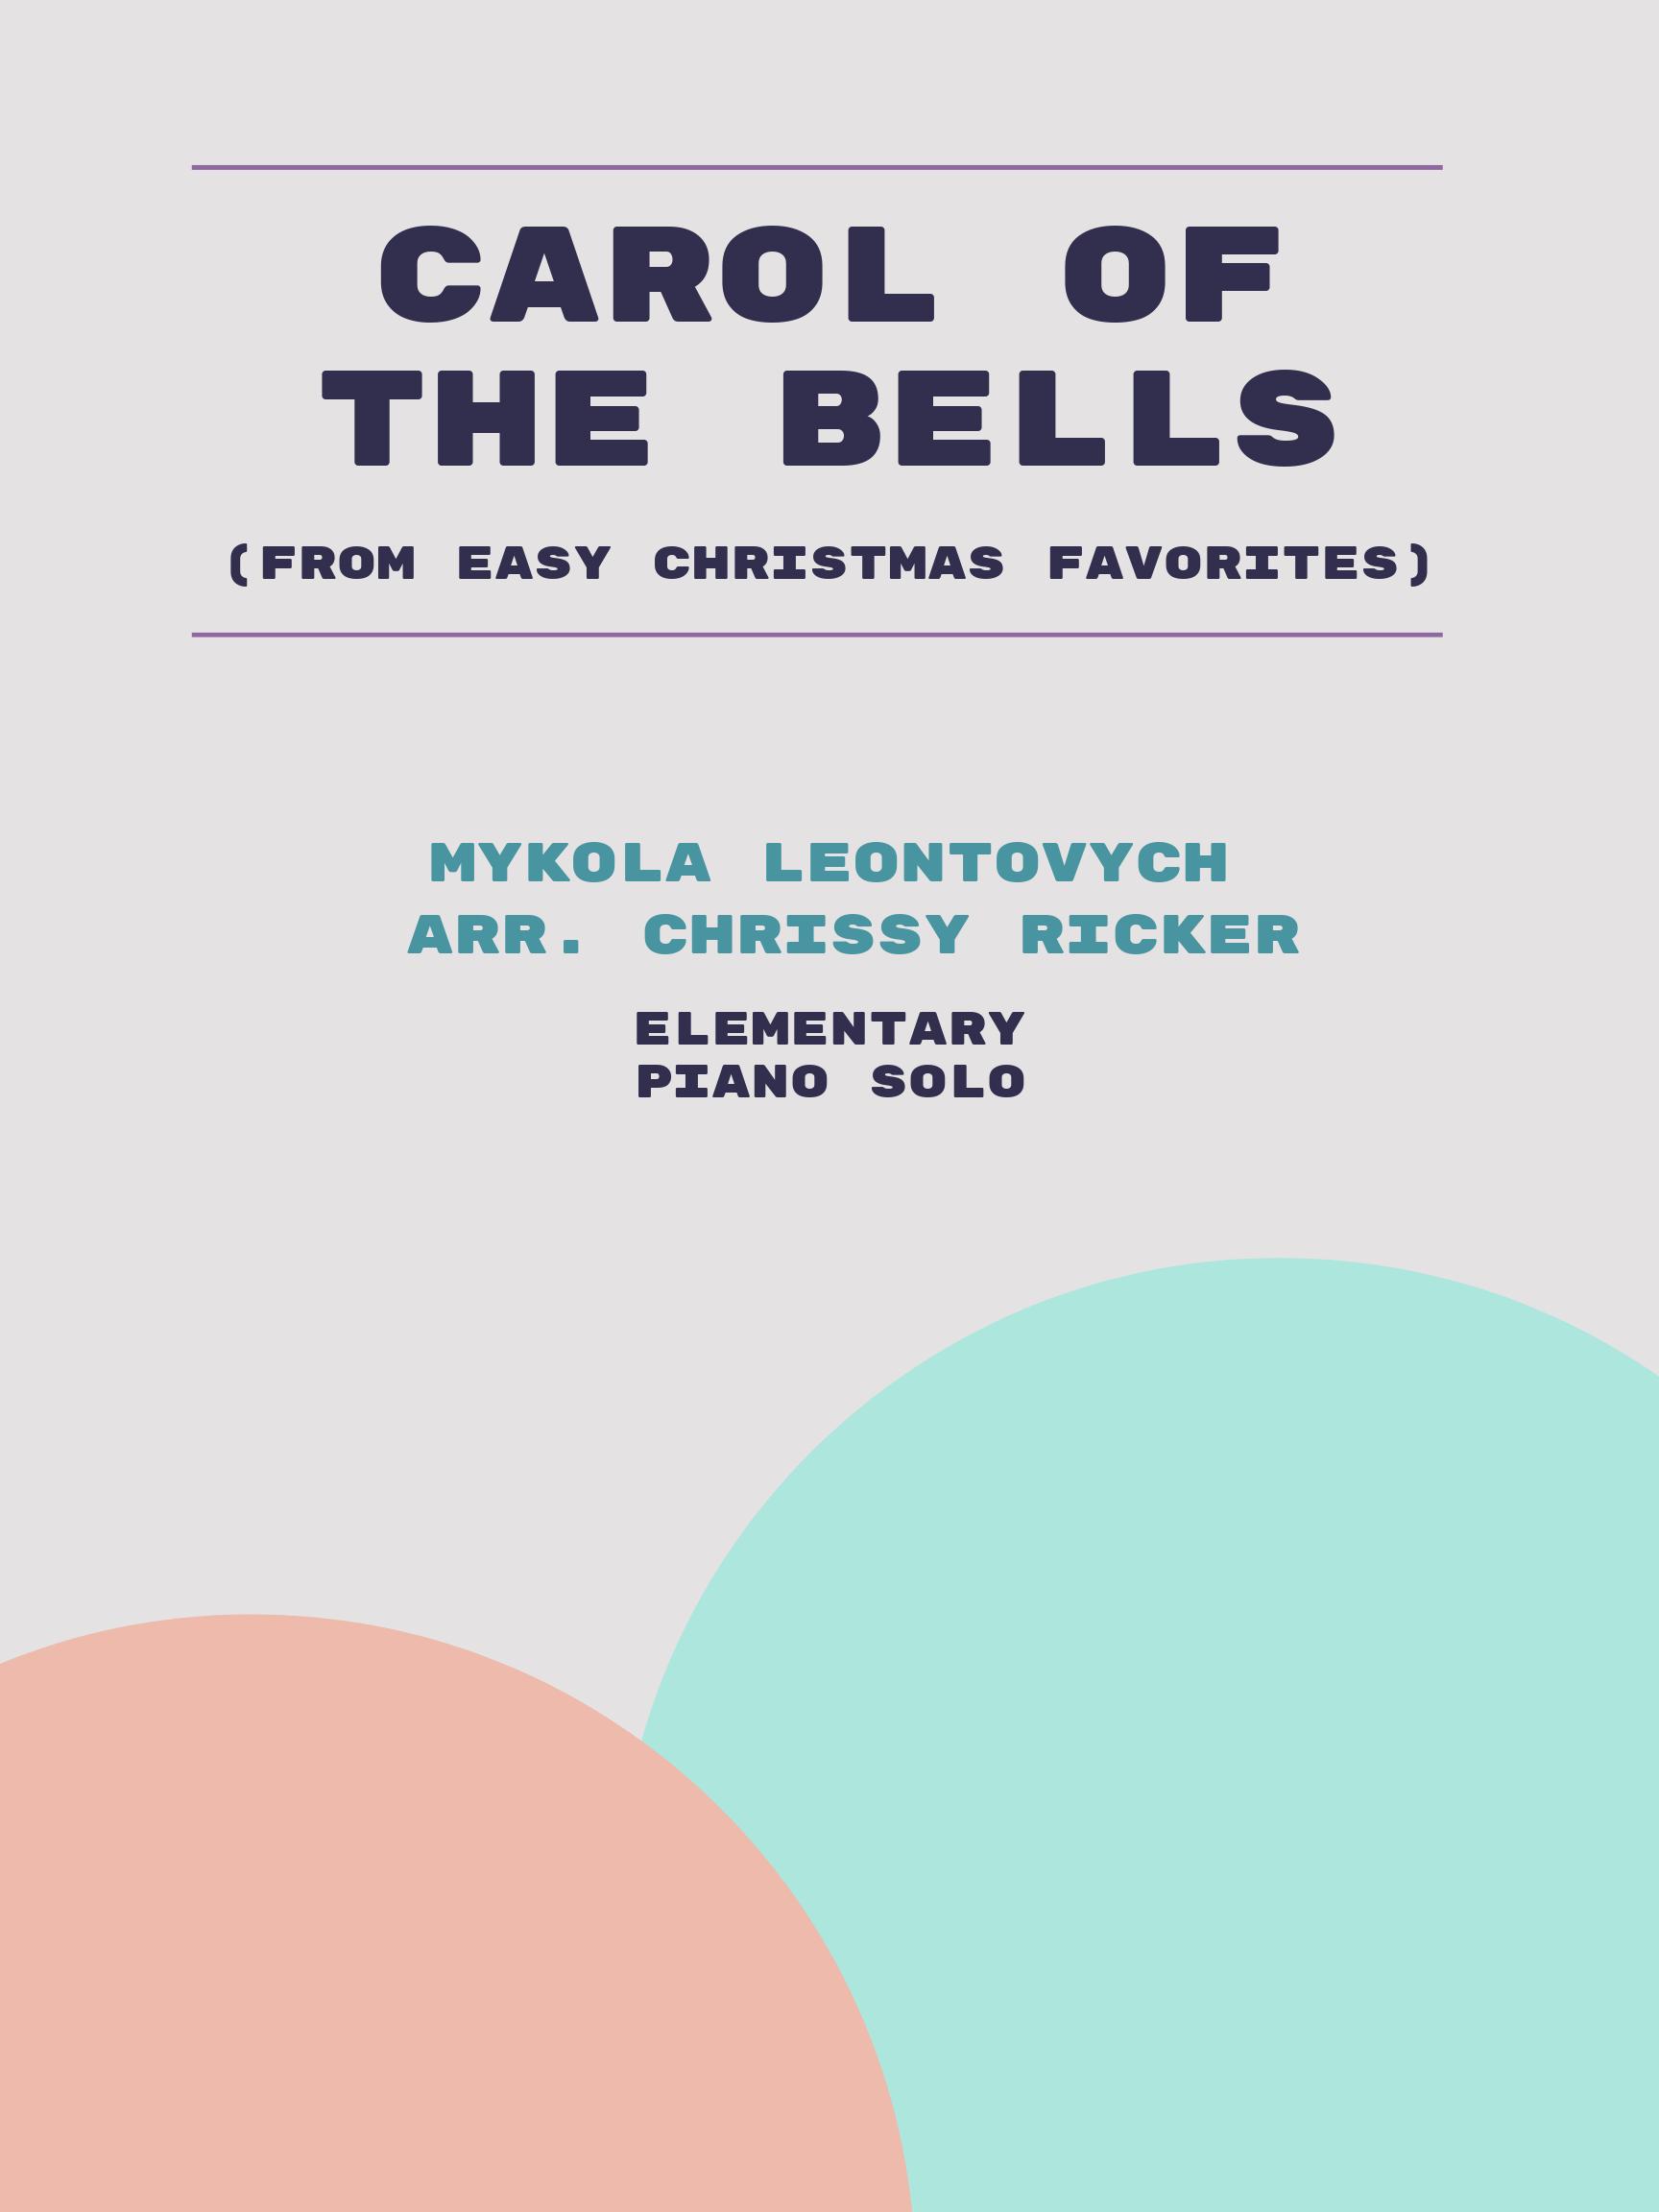 Carol of the Bells by Mykola Leontovych